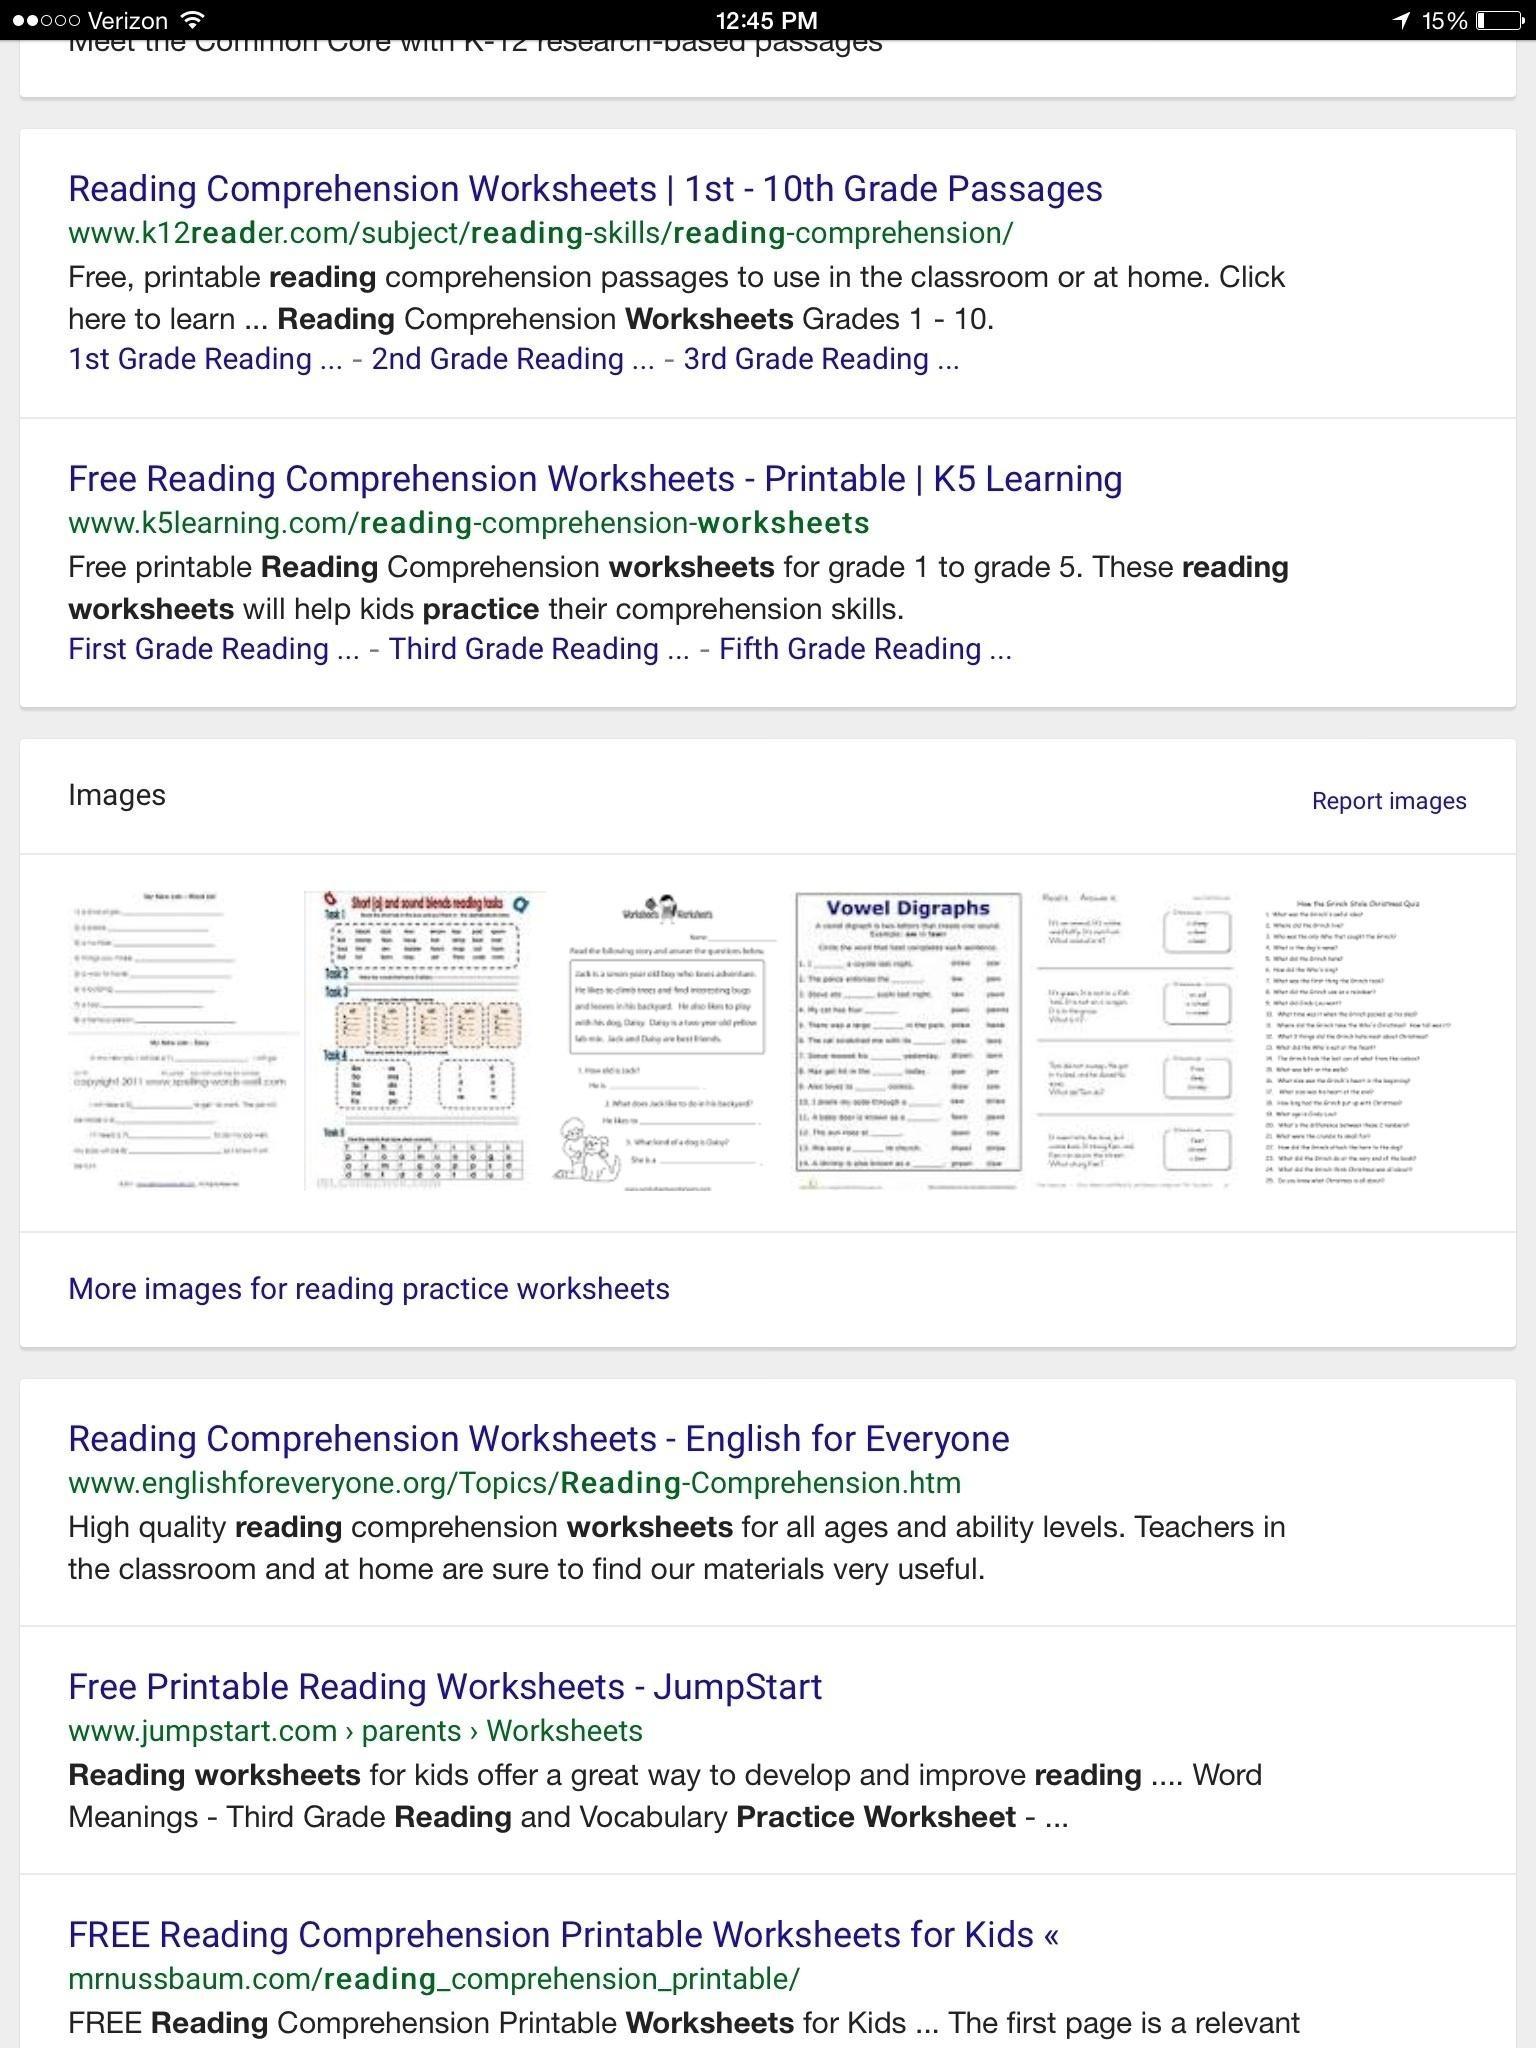 Fifth Grade Reading Comprehension Worksheets To Print - Math - Free Printable Worksheets Reading Comprehension 5Th Grade